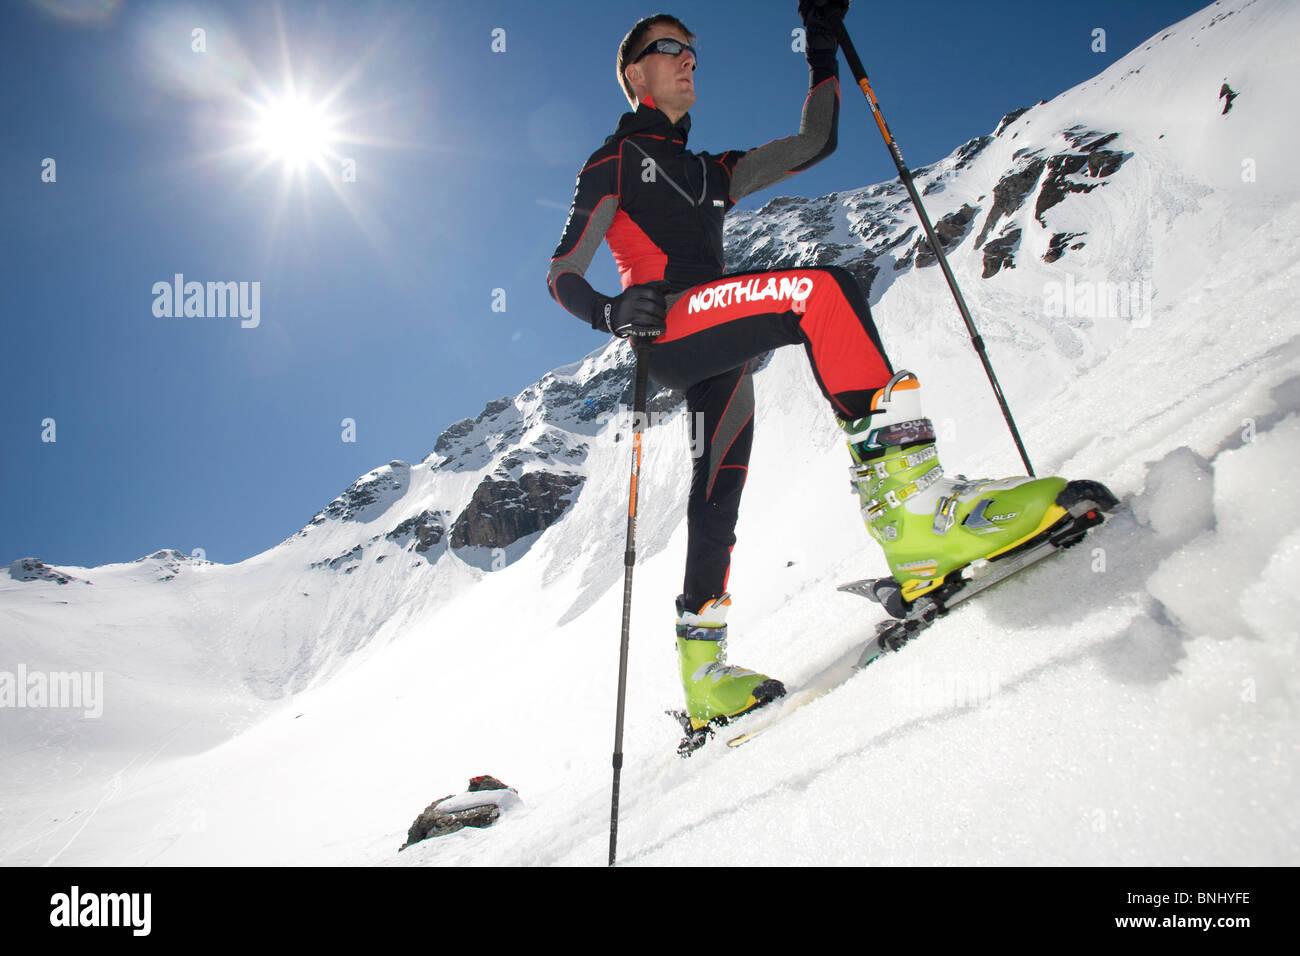 ski skiing winter sports sport snow freerider freeride freeriding